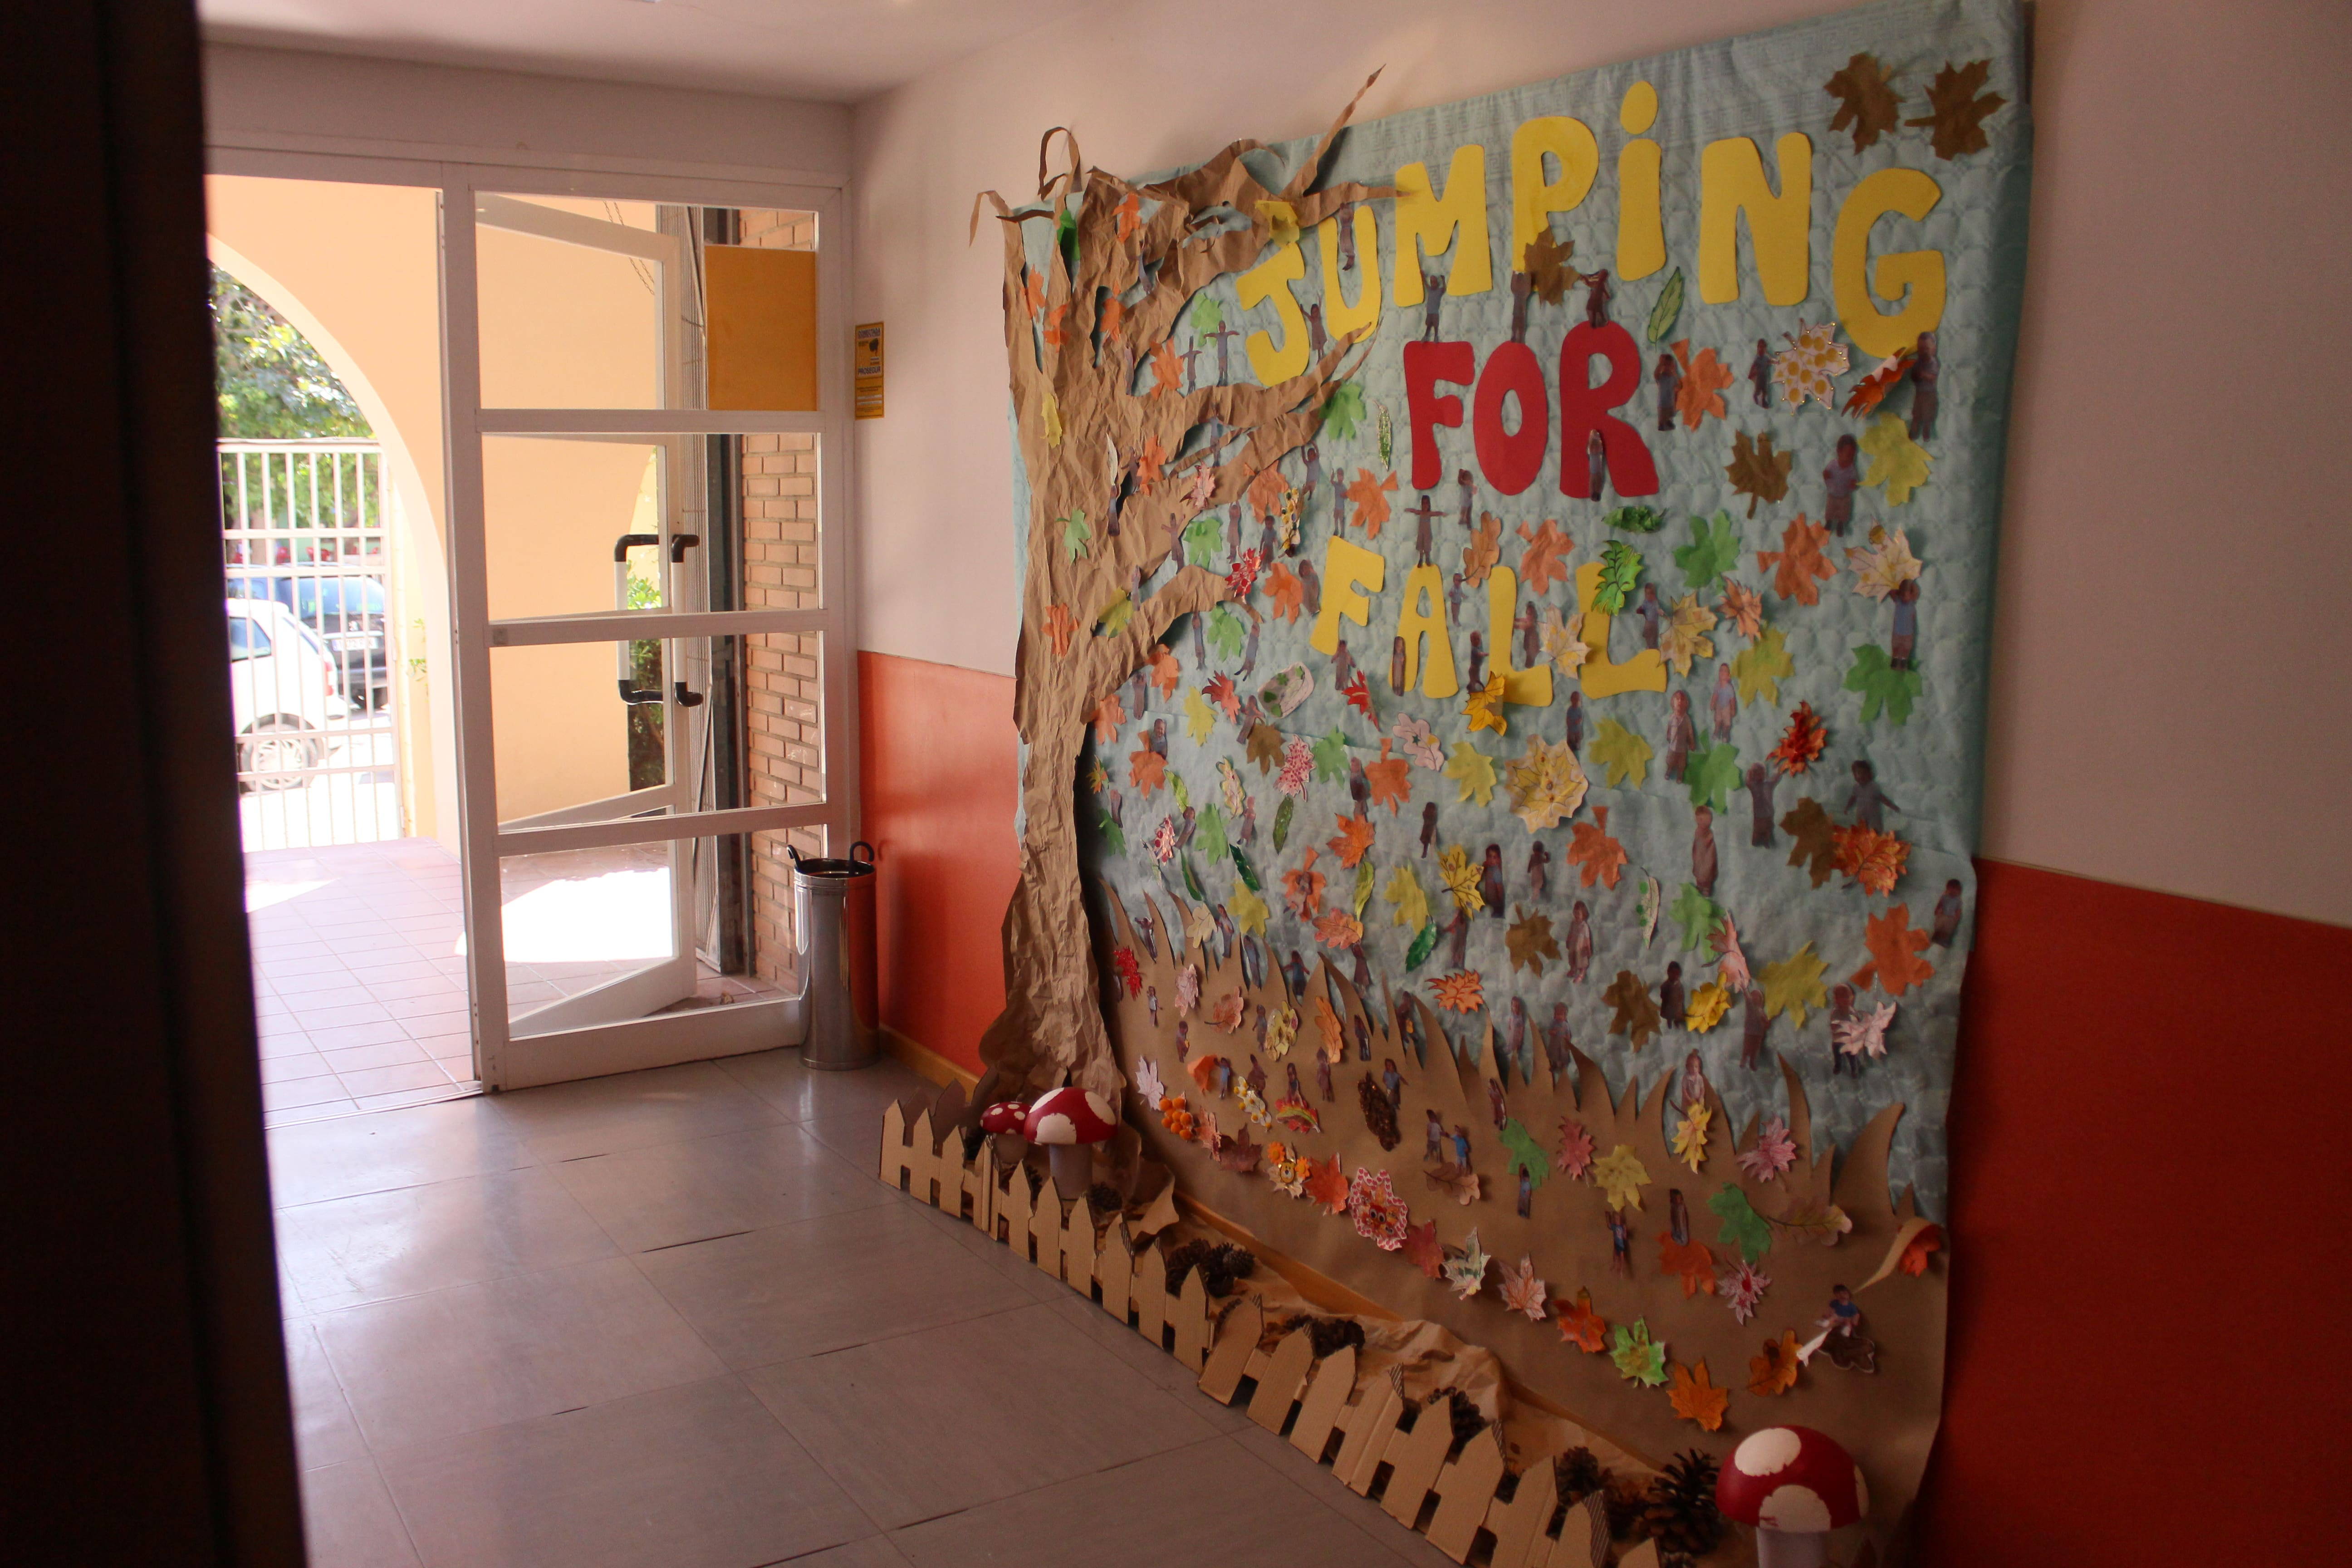 escuela infantil bilingüe en Valencia - mural